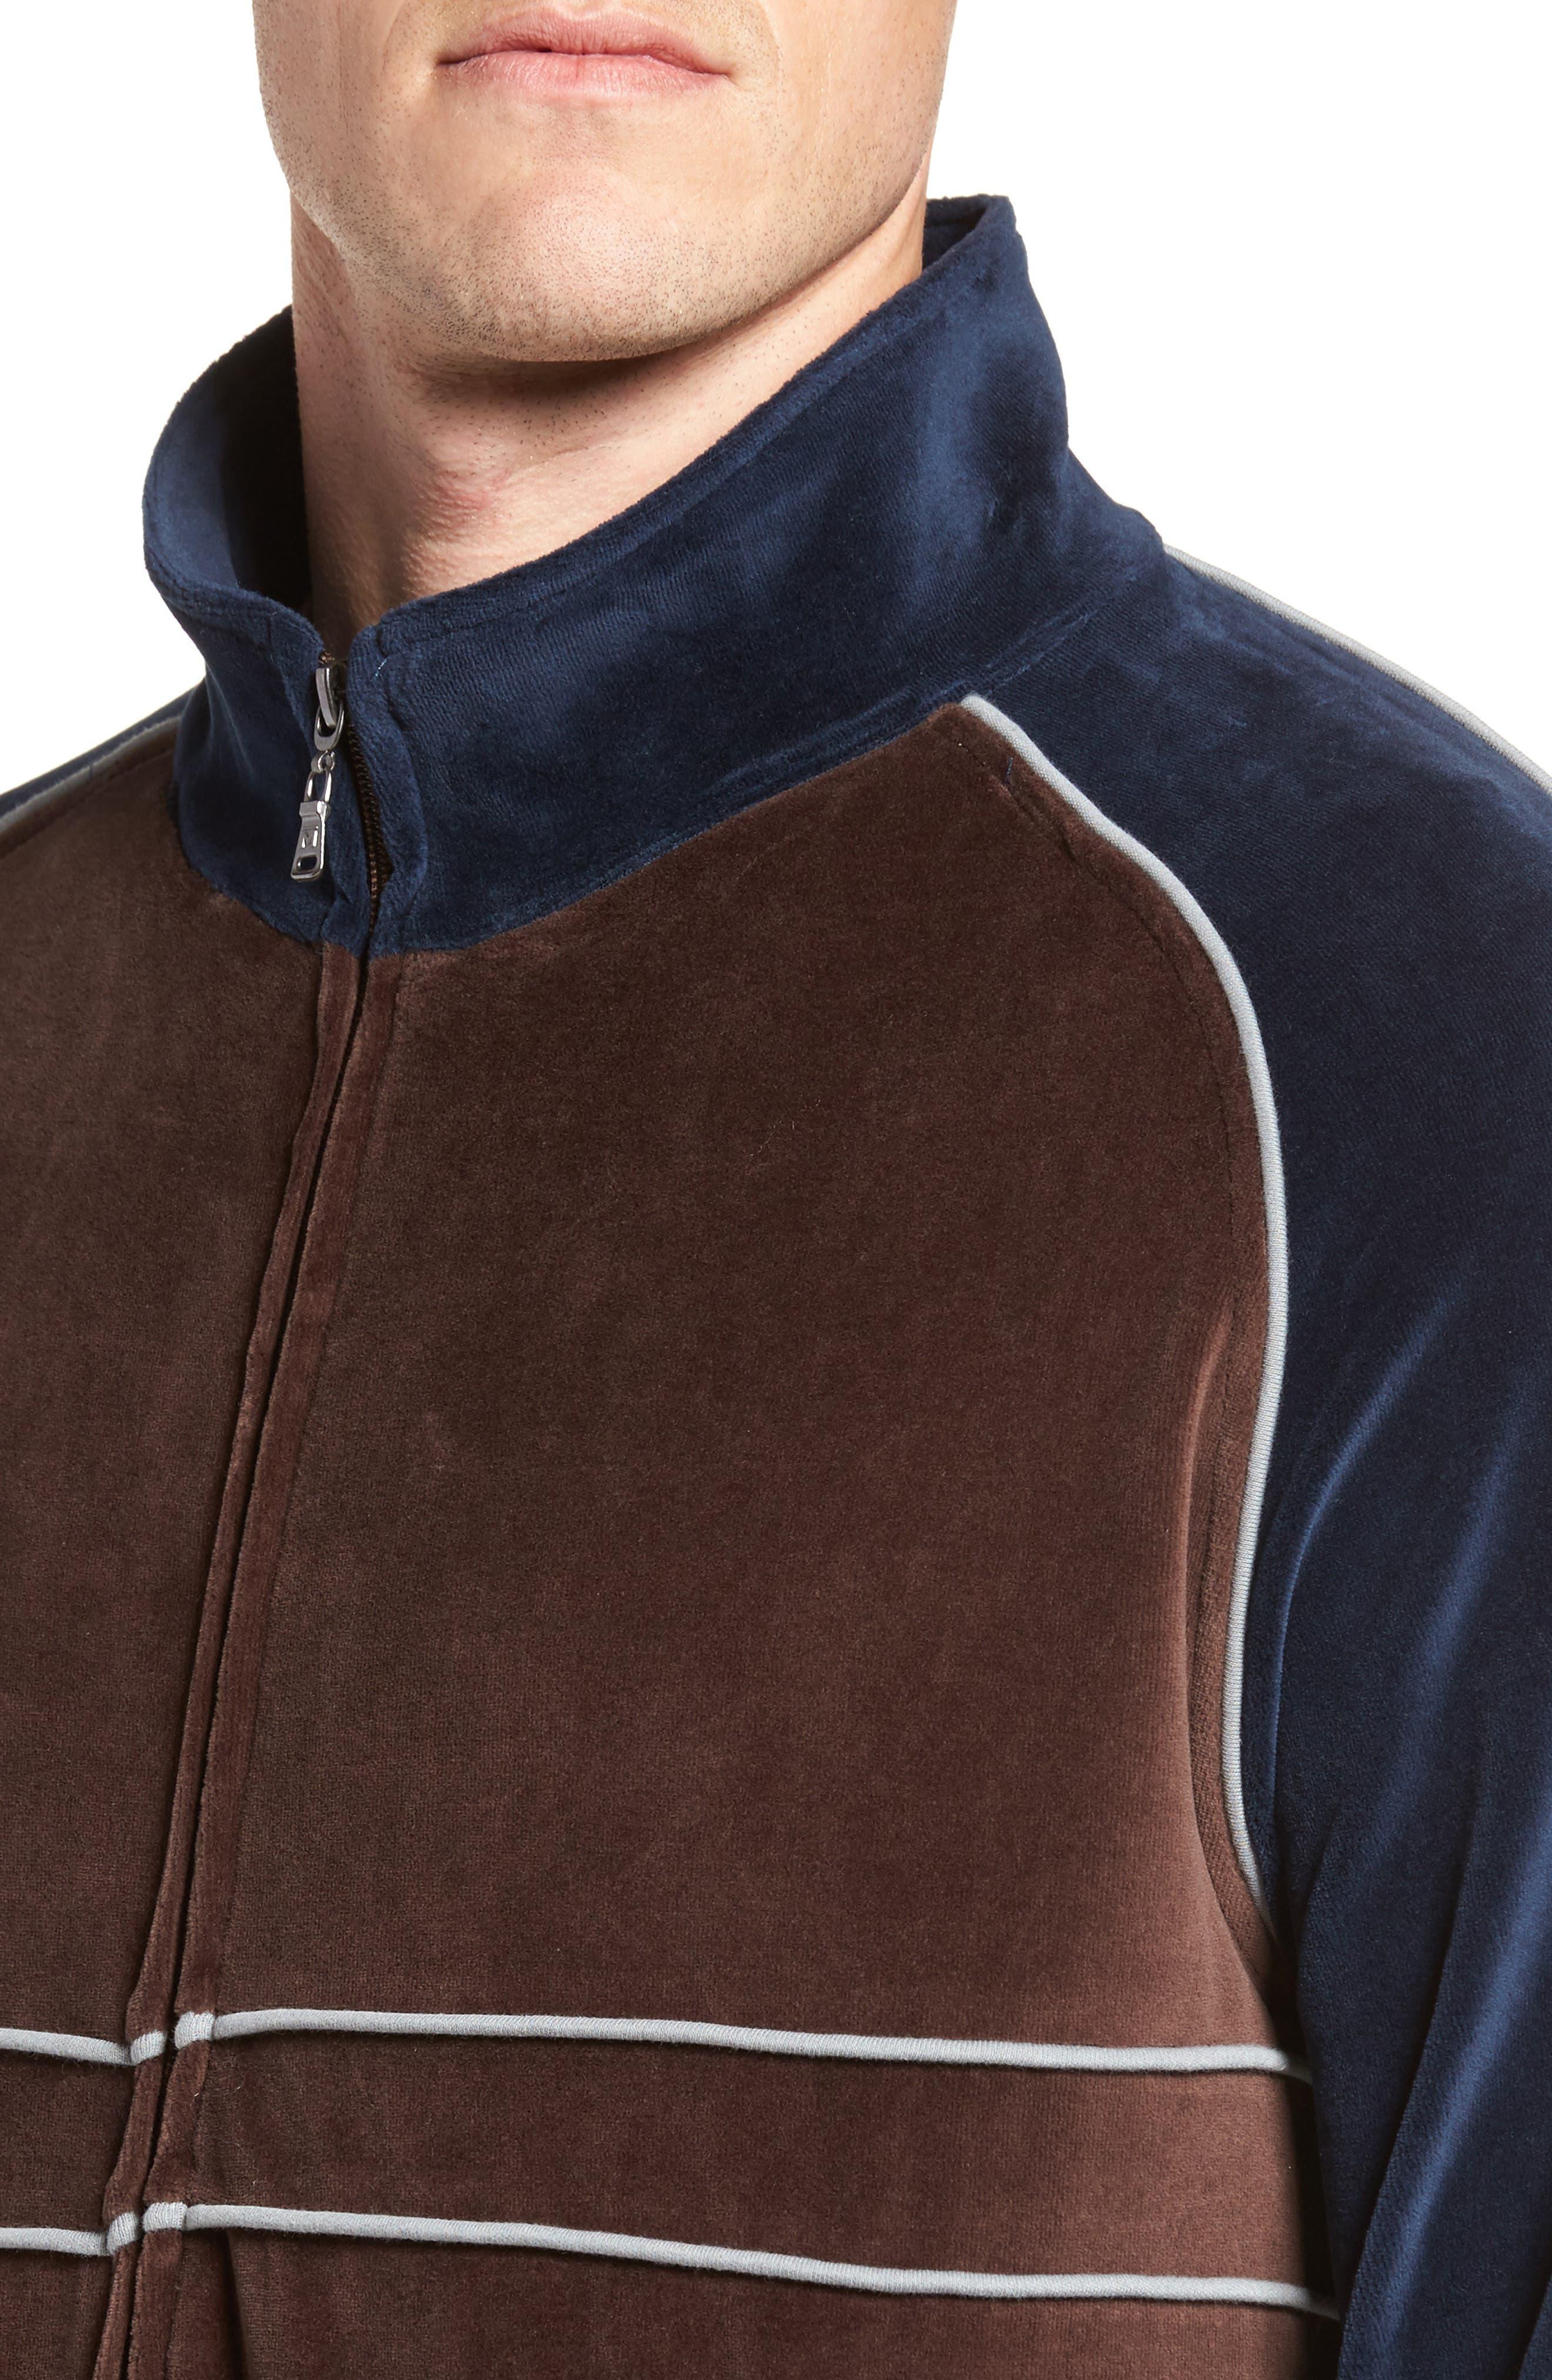 Strathcona Velour Warm-Up Suit,                             Alternate thumbnail 4, color,                             410